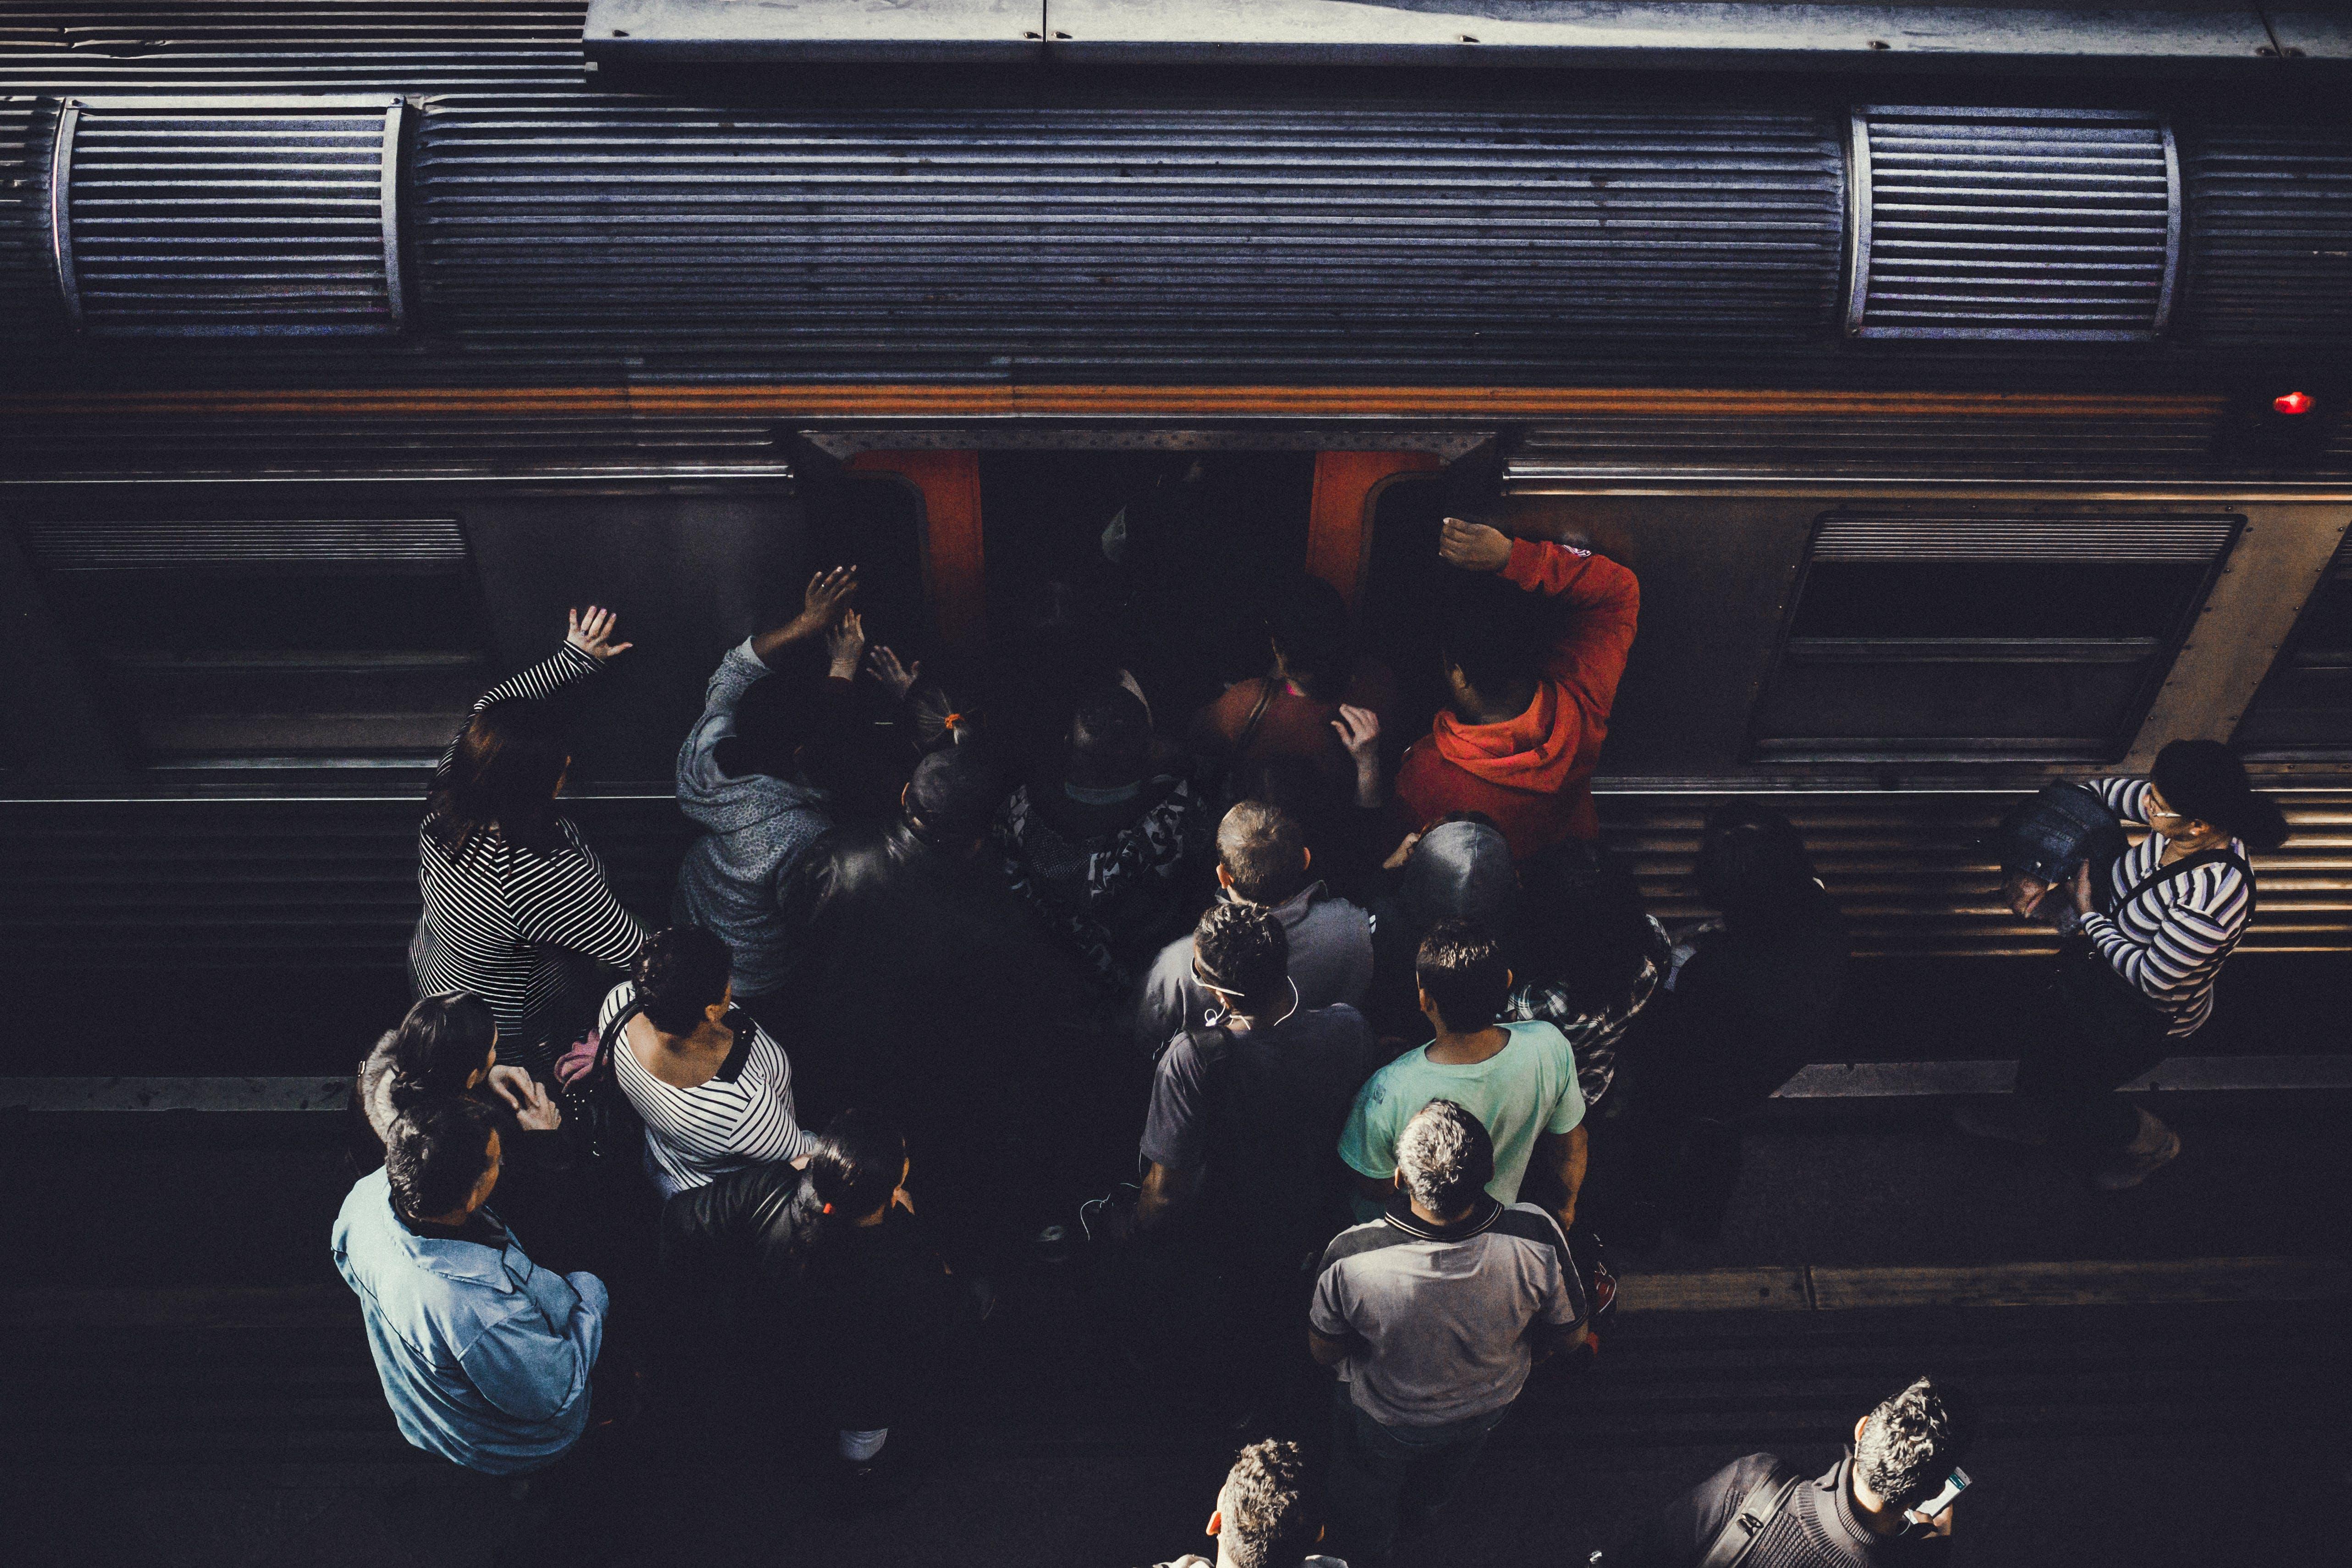 People Gathering Near Train